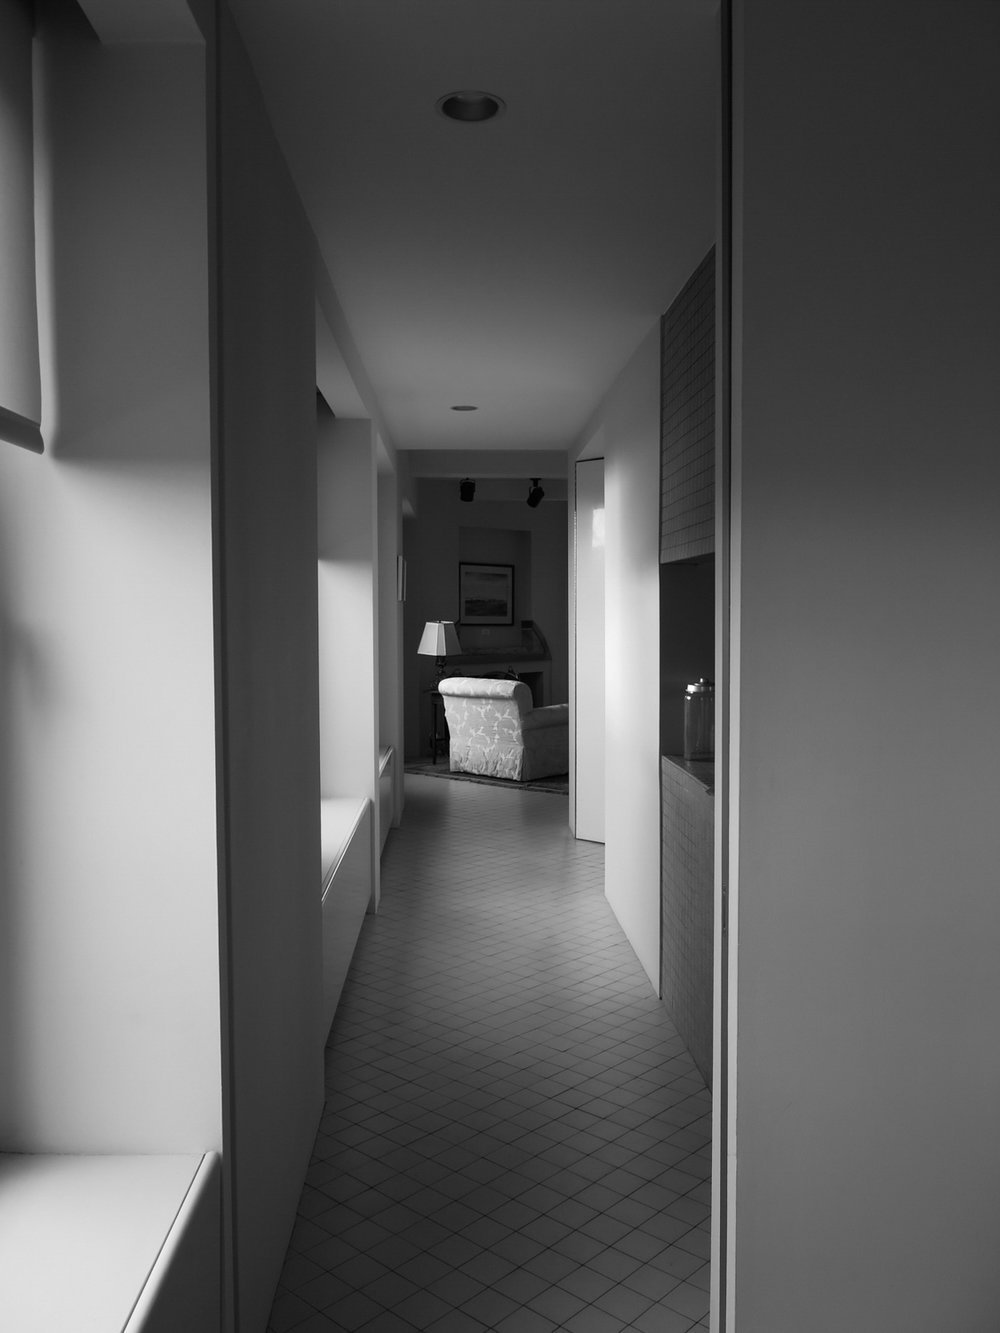 Empty Hallway, 20x30 cm (8.3x11.7 in), digital print, 2016